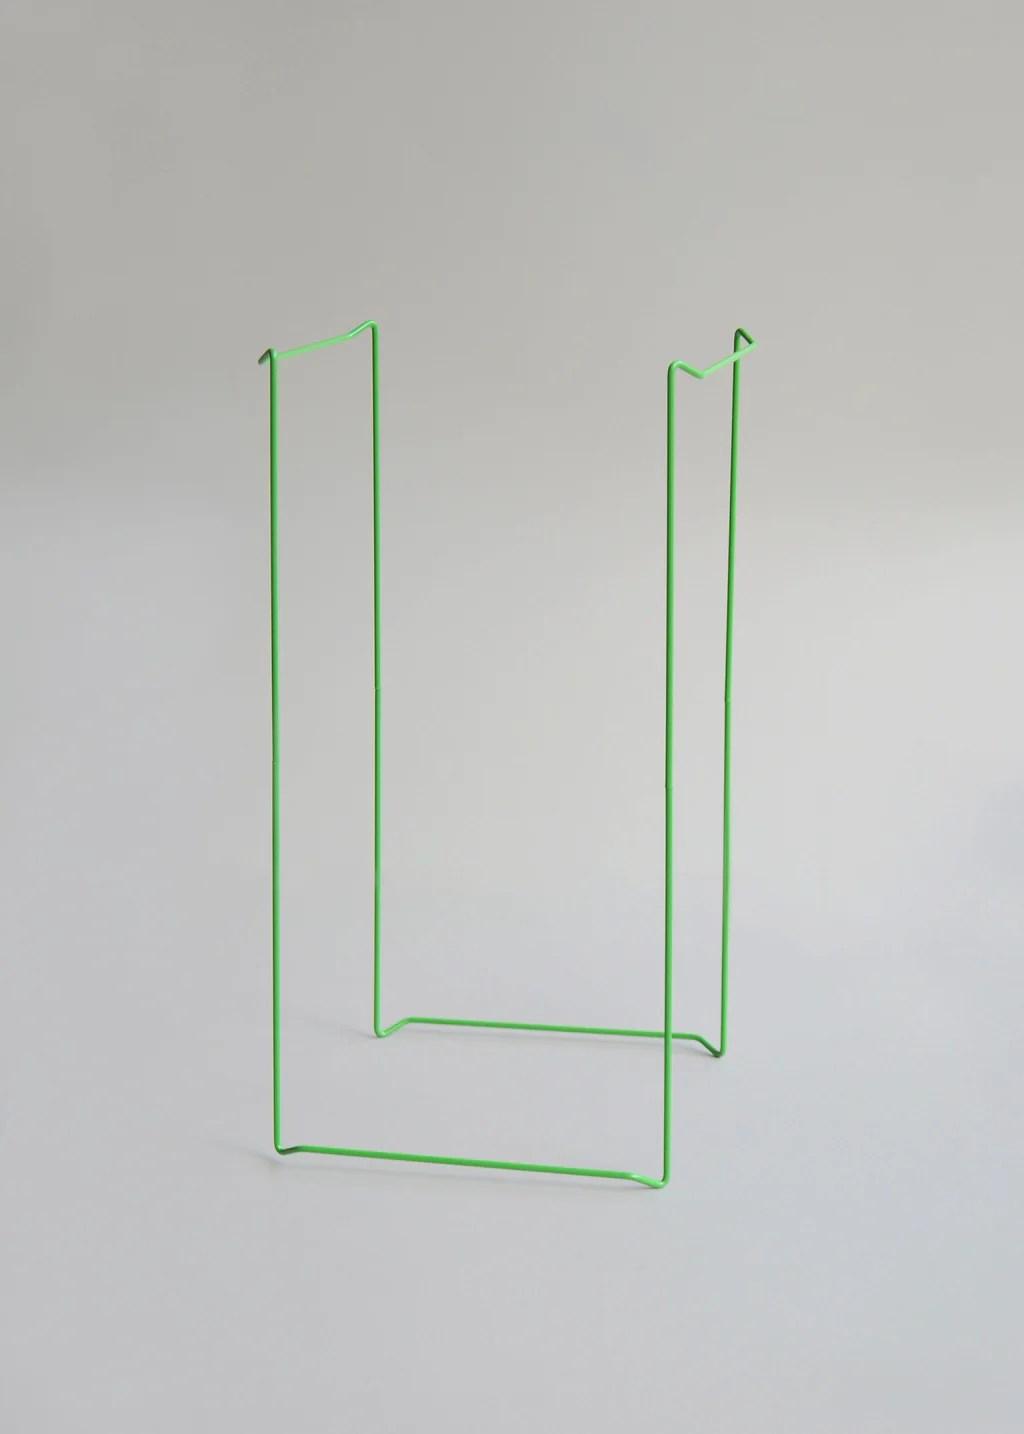 diagram of plastic bag [ 1024 x 1434 Pixel ]